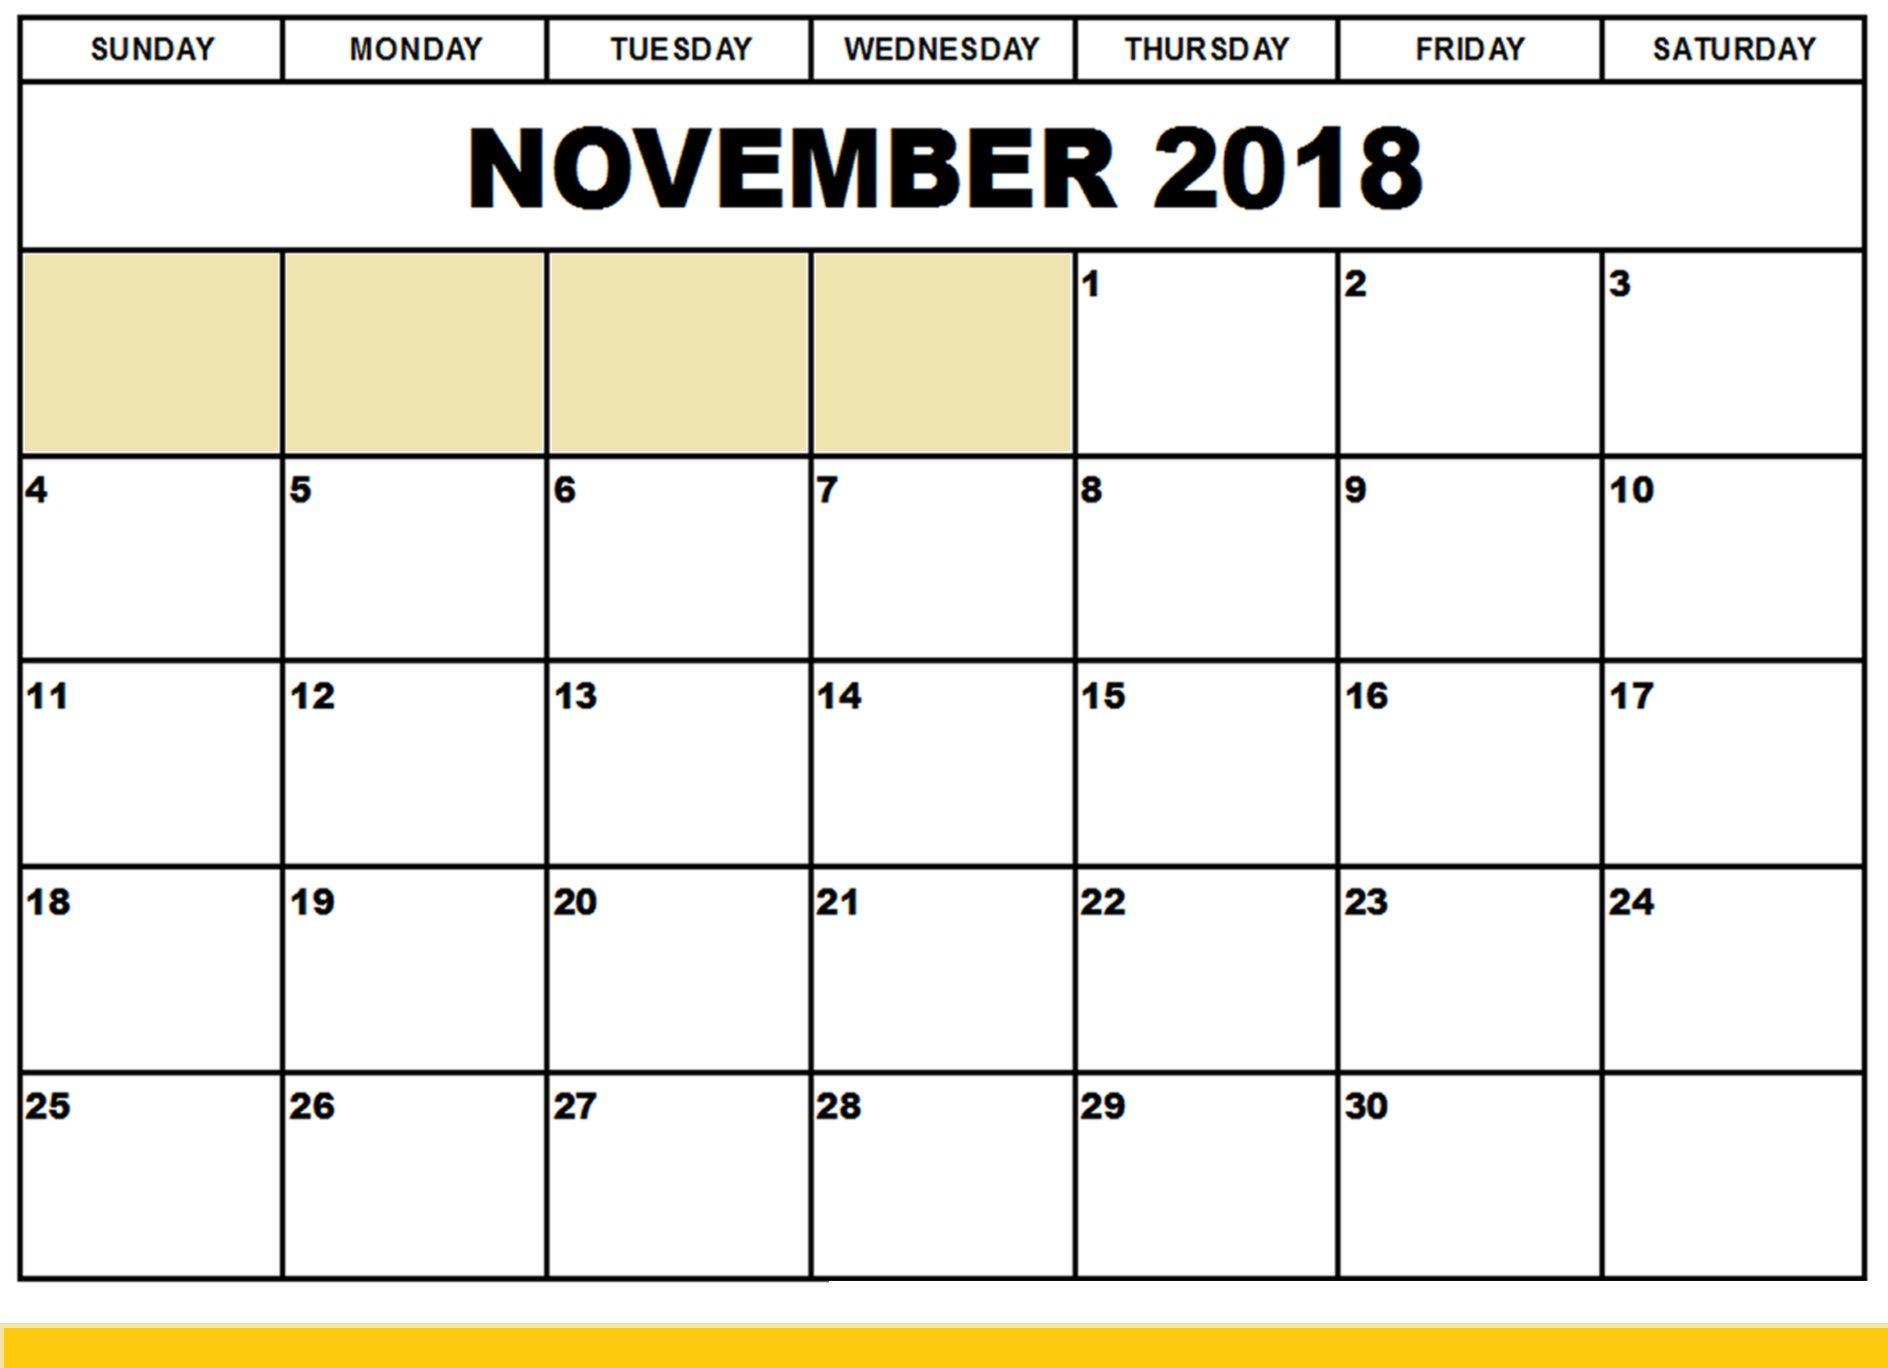 Printable November 2018 Calendar Large Print | November 2018 inside Blank Printable November Calendar